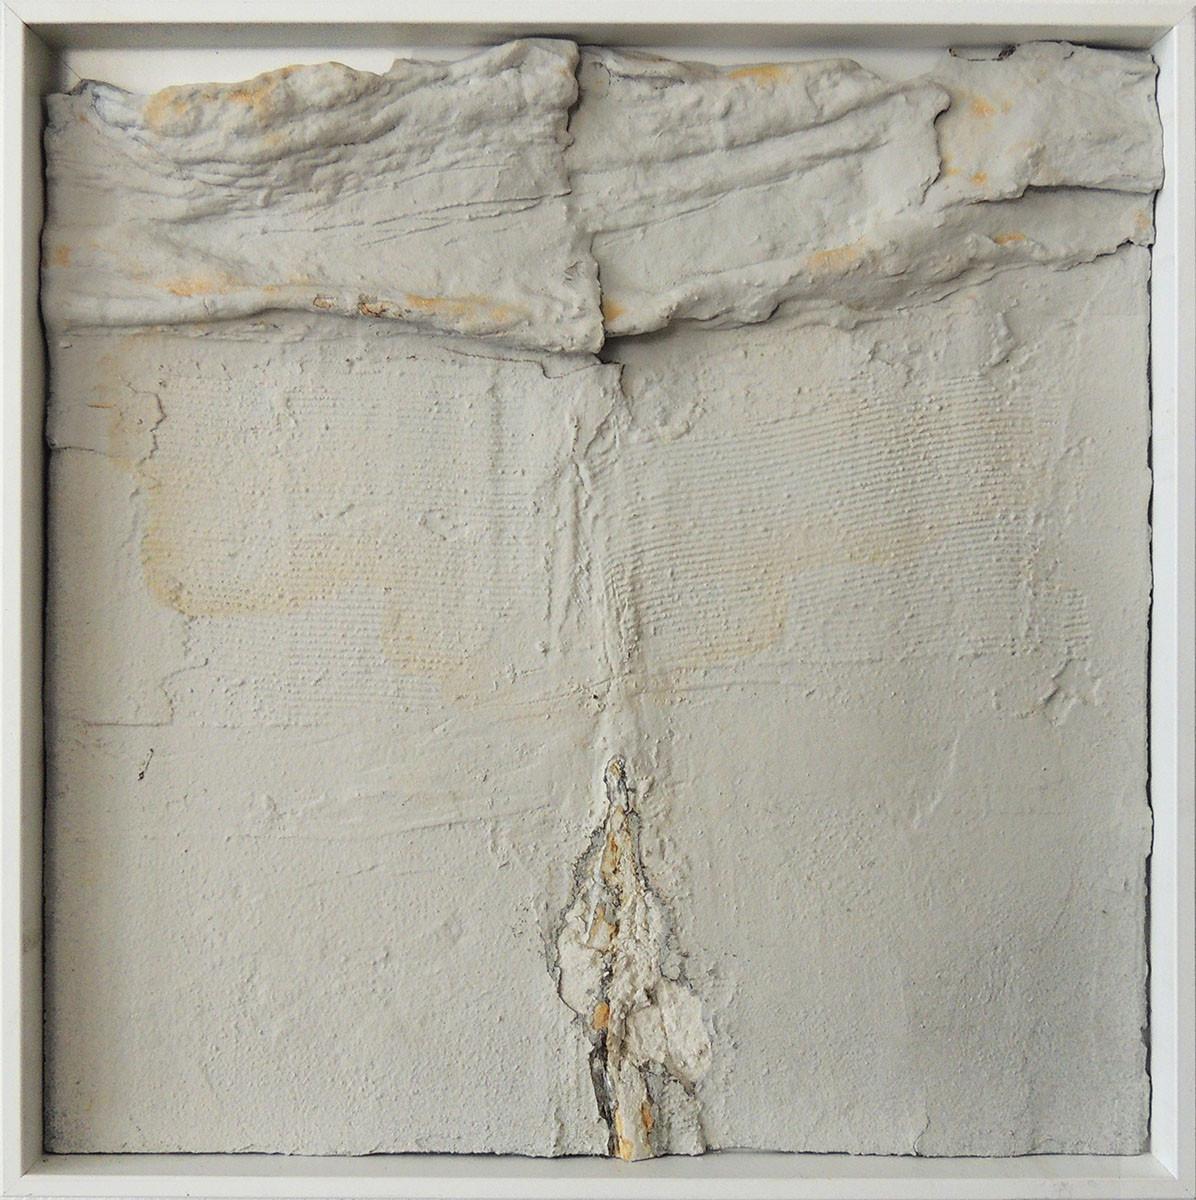 Terre-a-terre-acryle-beton-30-x-30-cm-2019